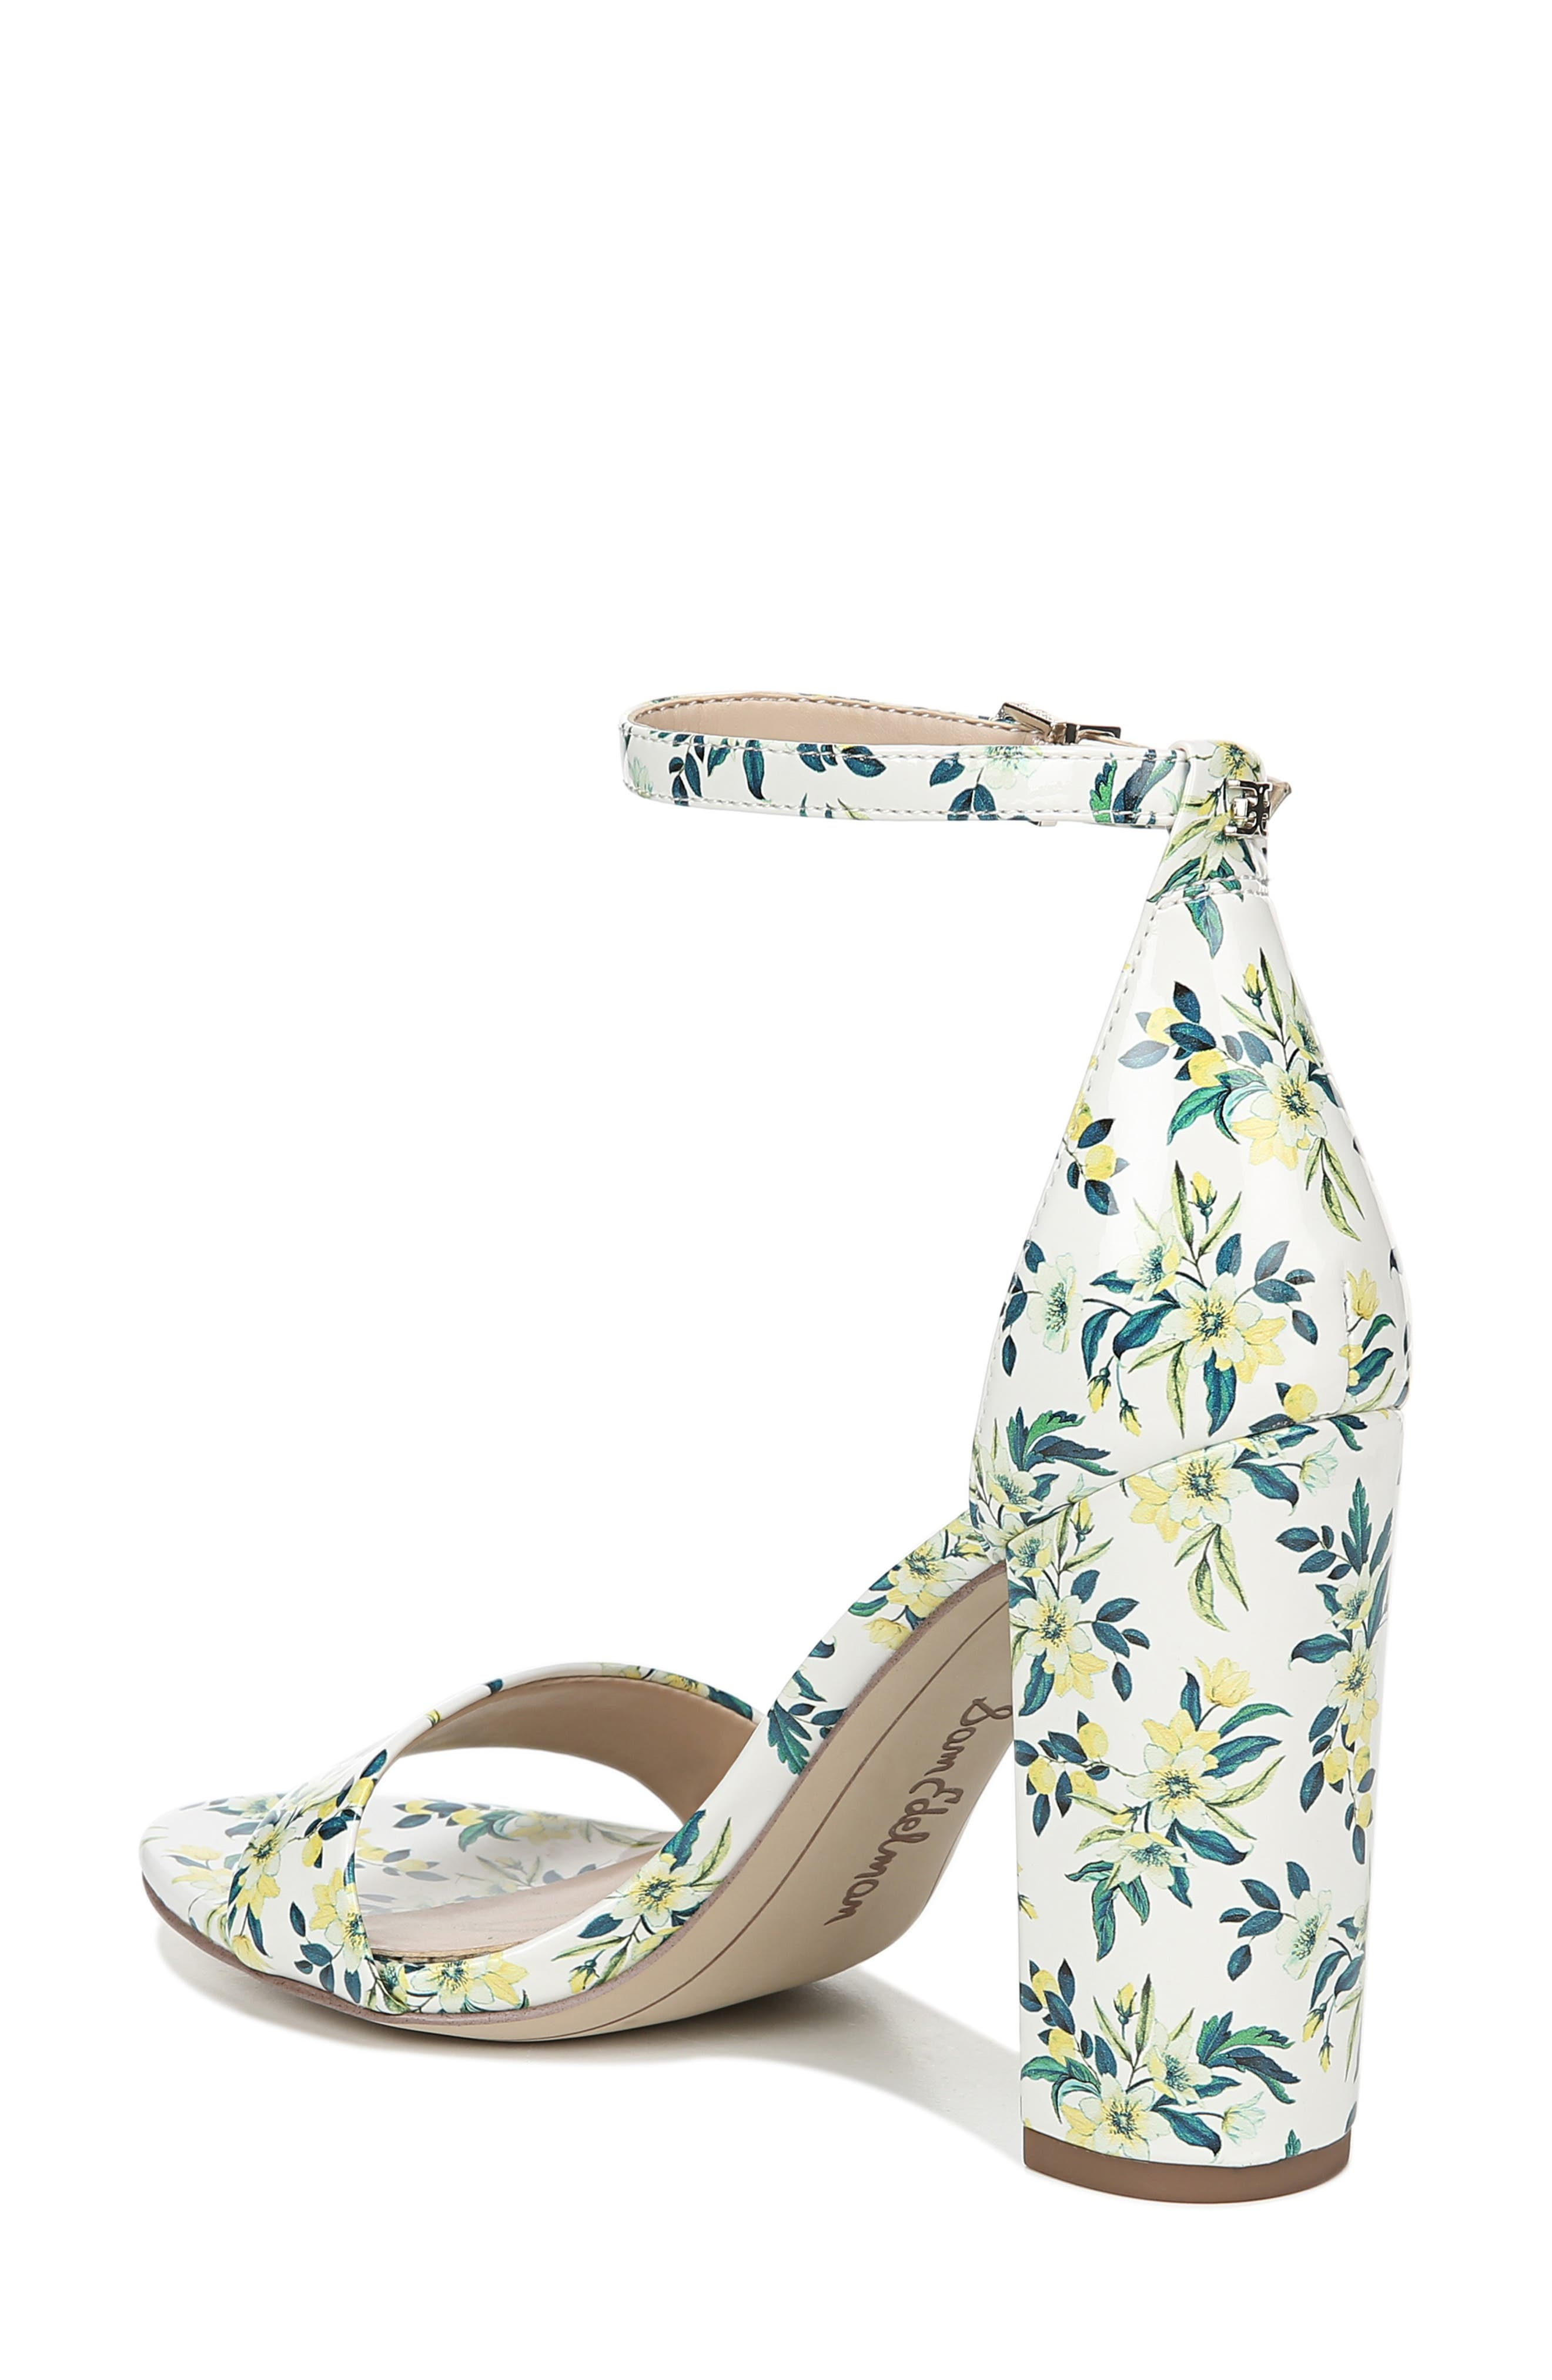 Yaro Ankle Strap Sandal,                             Alternate thumbnail 2, color,                             WHITE MULTI FABRIC